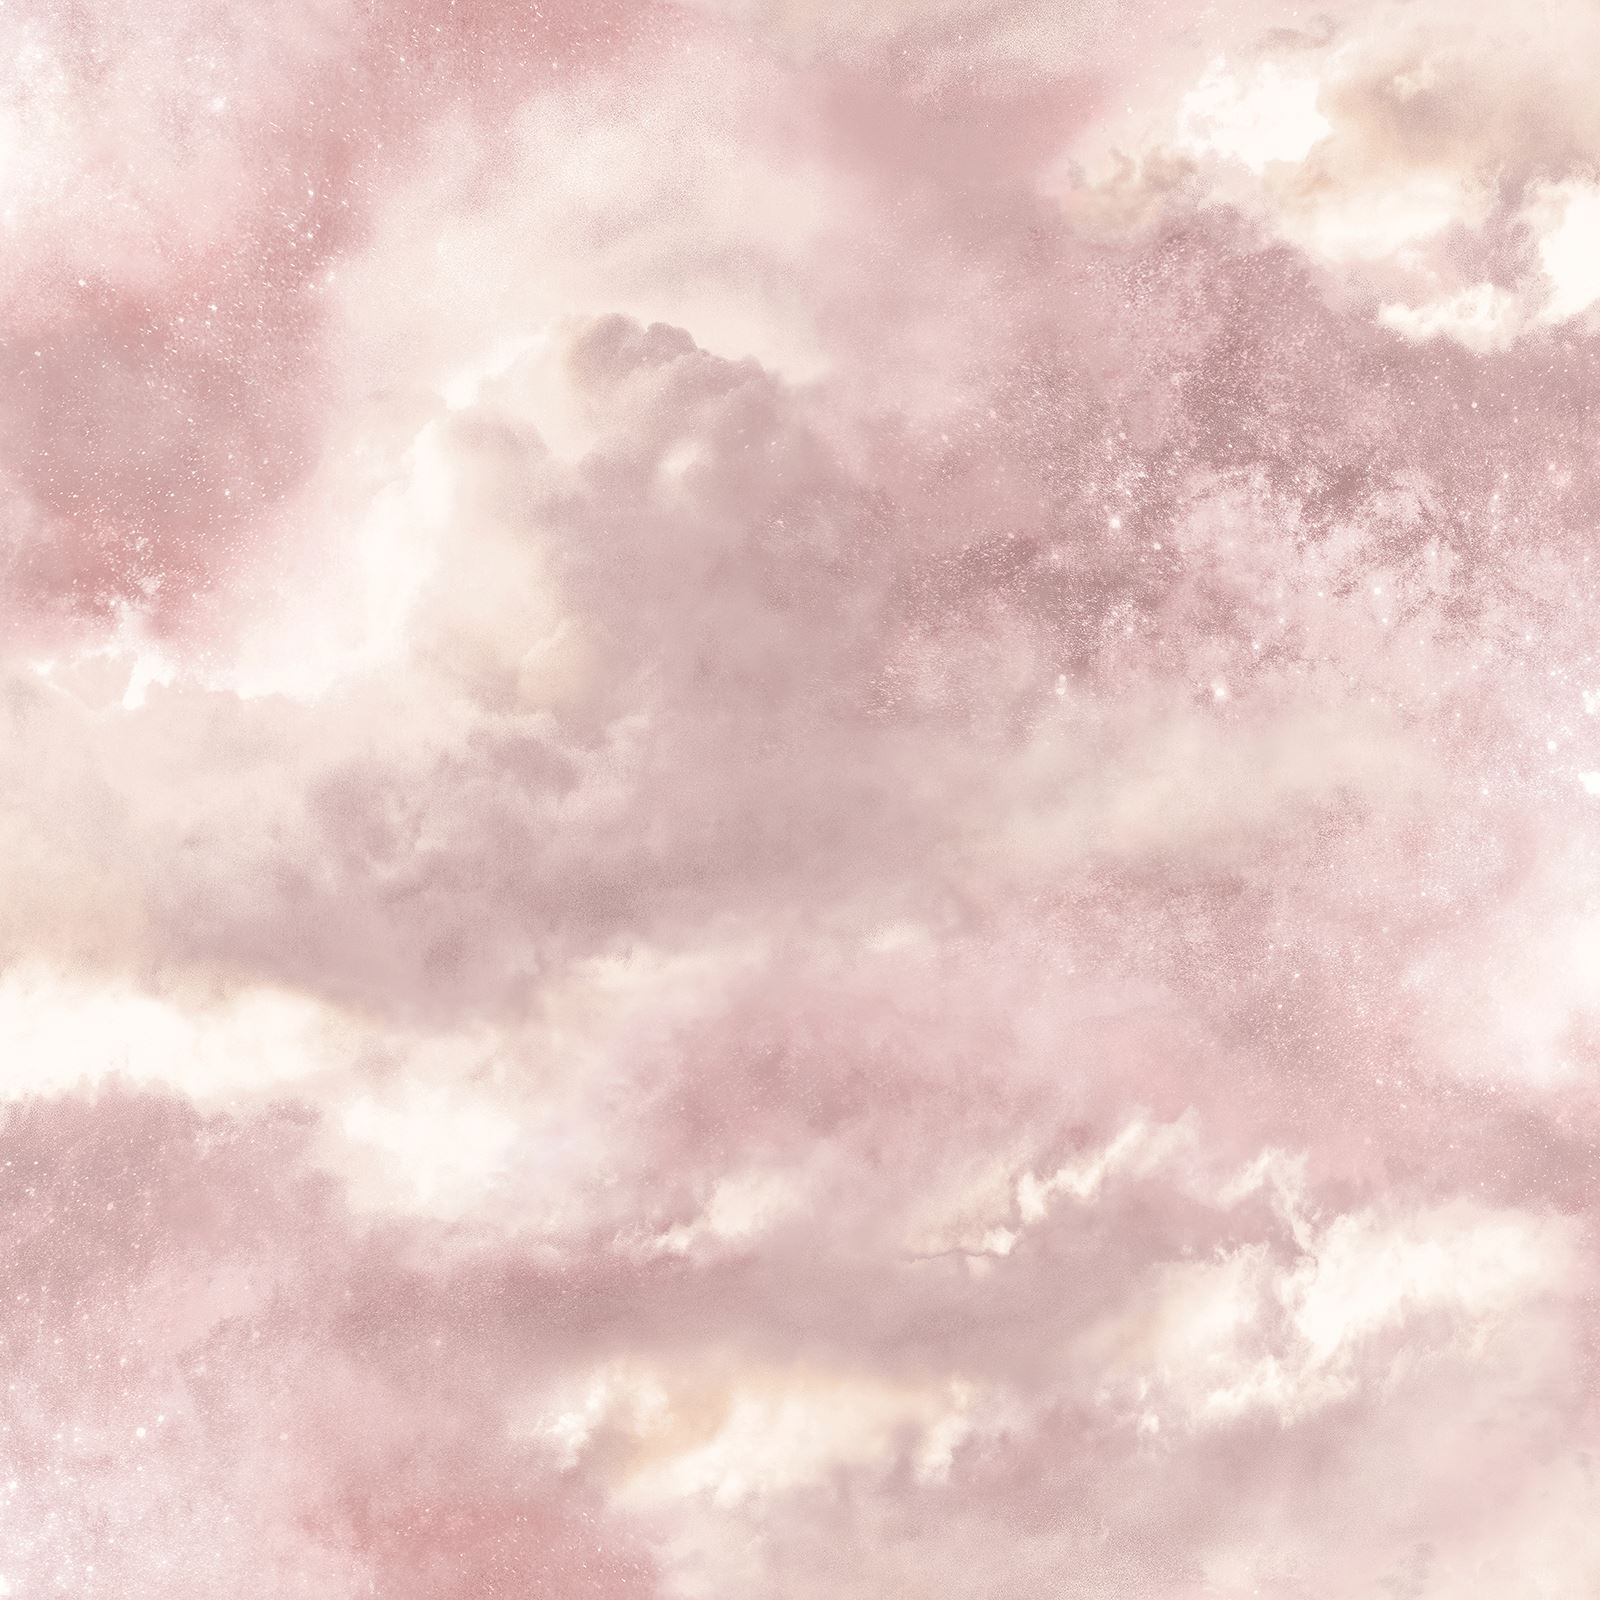 Diamond galaxy cloud wallpaper blush pink arthouse 260006 glitter new 5050192260060 ebay - Galaxy cloud wallpaper ...